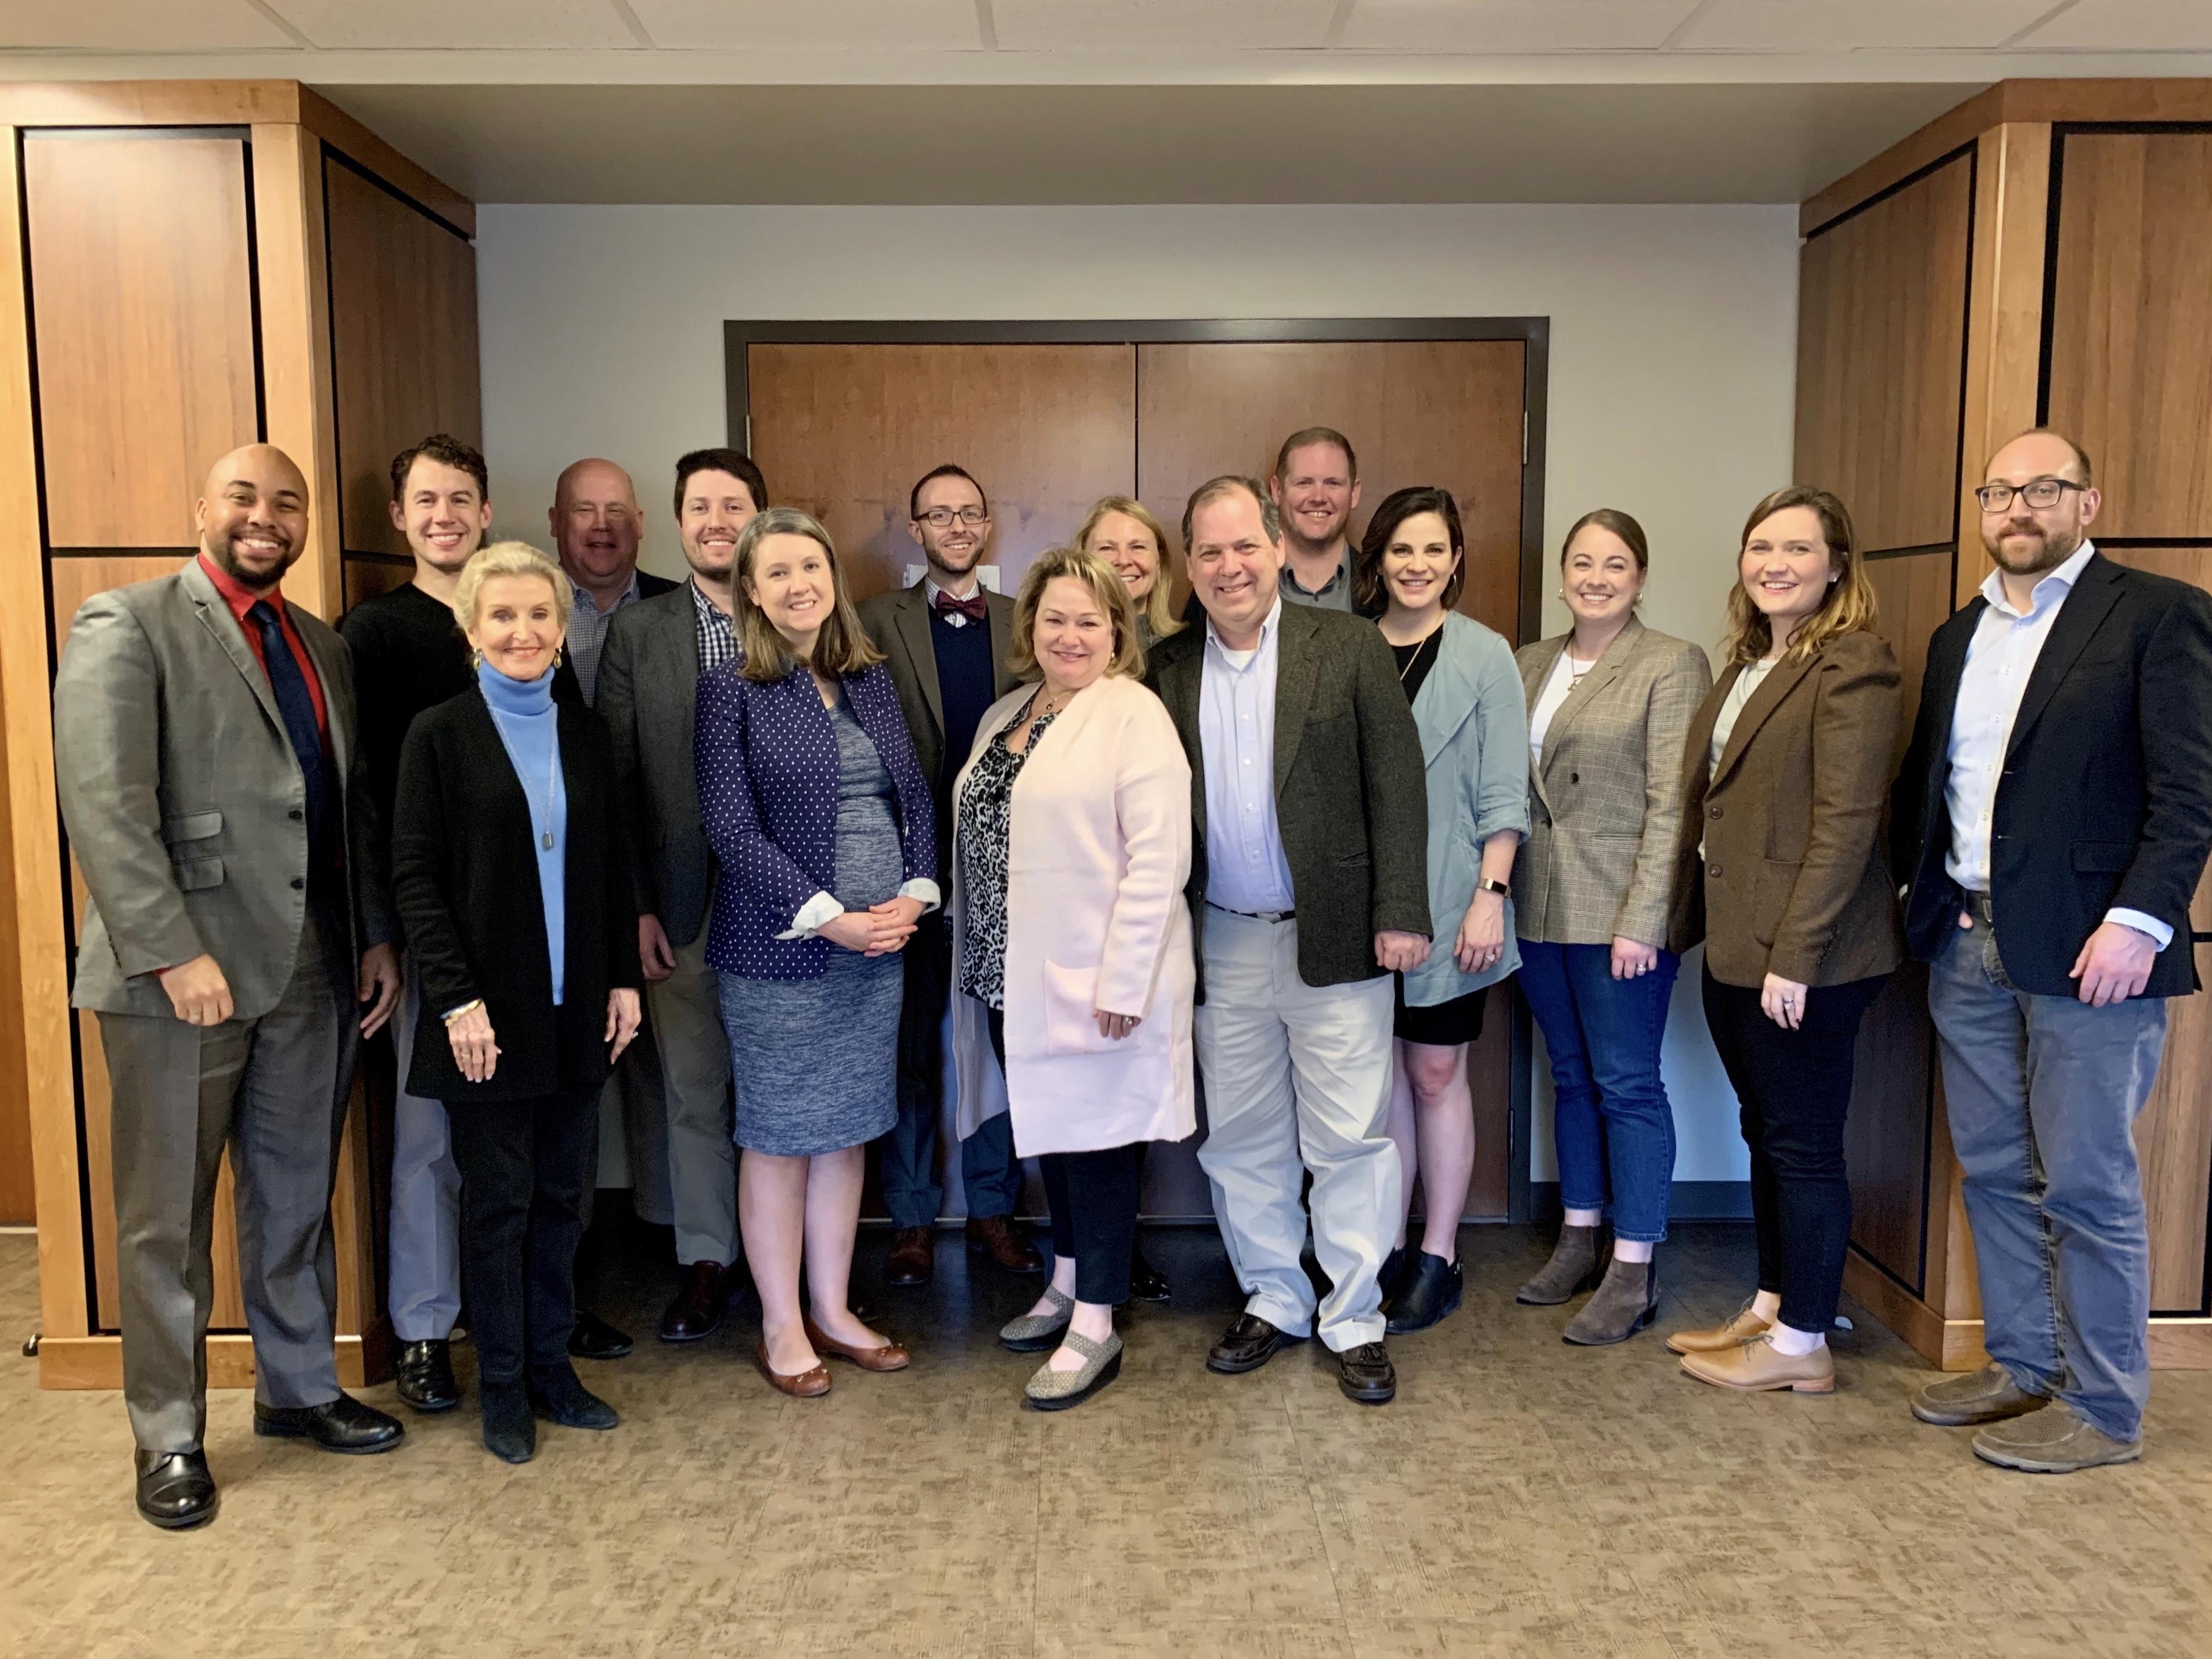 SMBHC Leadership Council Convenes